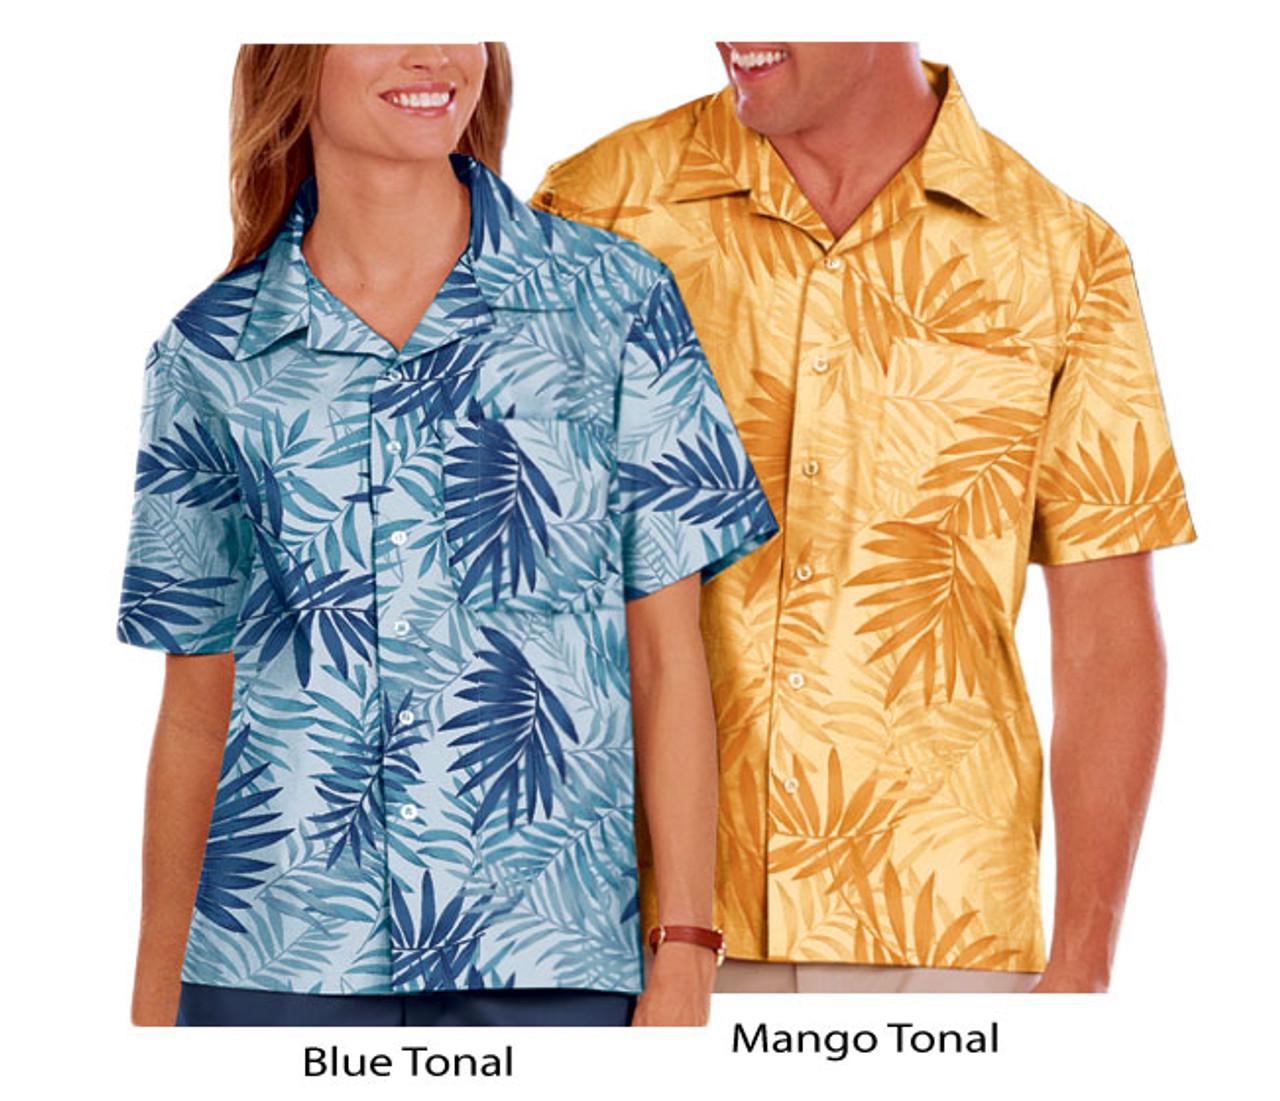 Blue tonal and mango tonal camp shirts